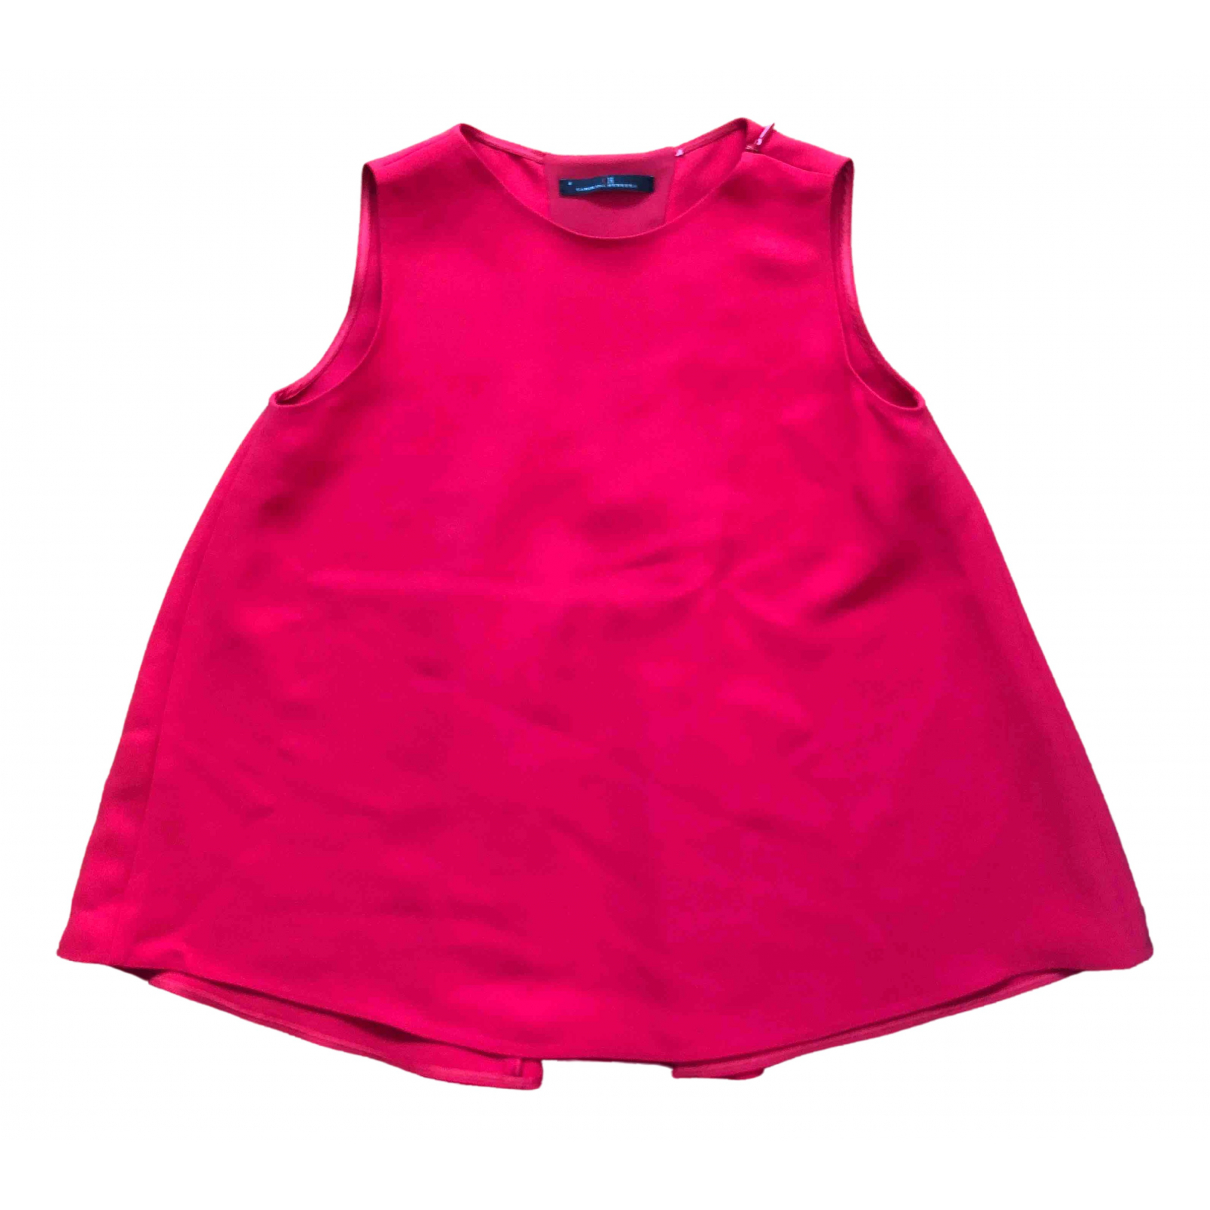 Carolina Herrera - Top   pour femme - rouge